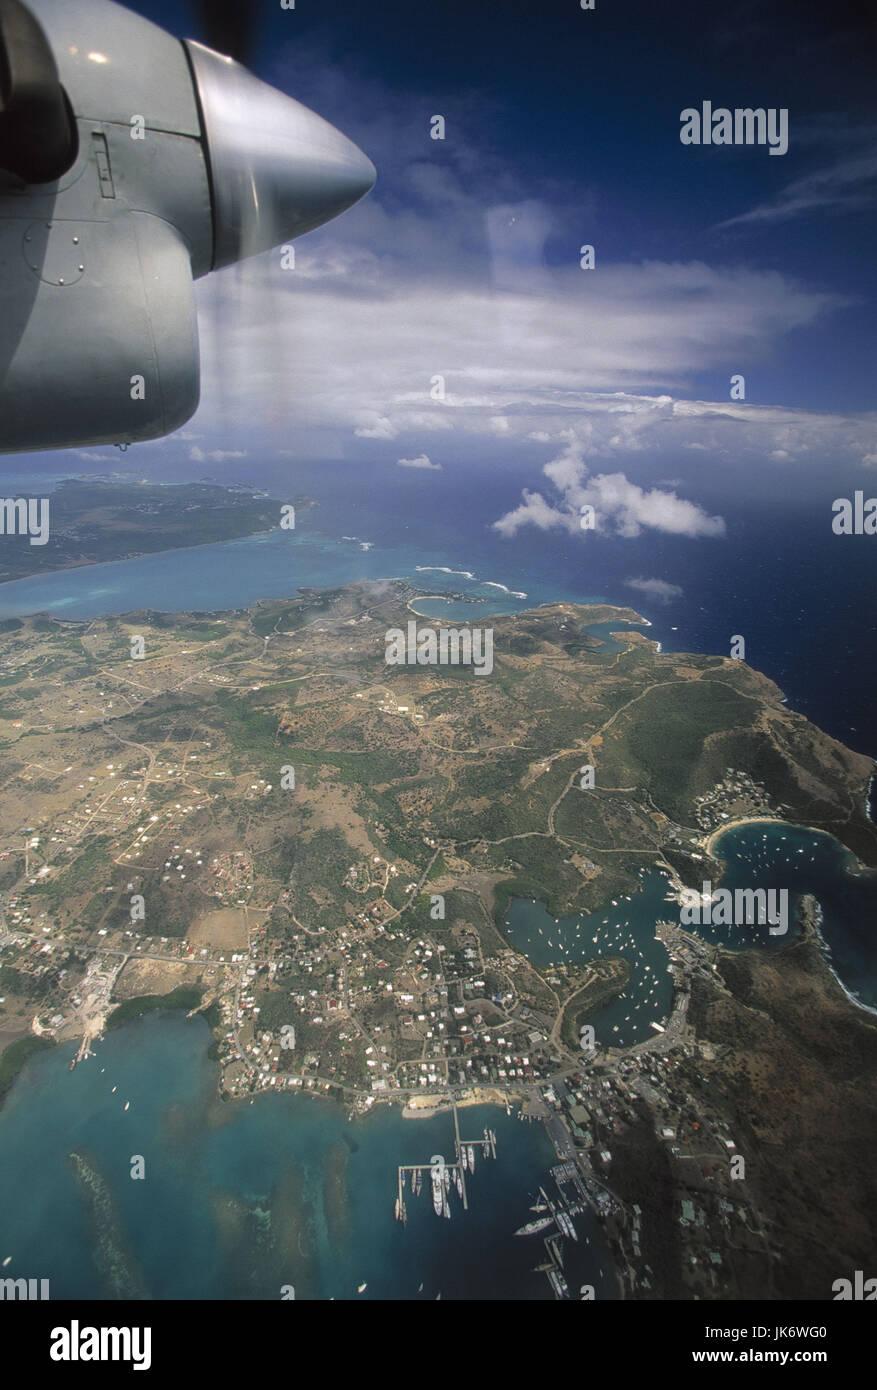 Karibik, Kleine Antillen, Antigua, Nelsons Dockyard, Luftaufnahme ...